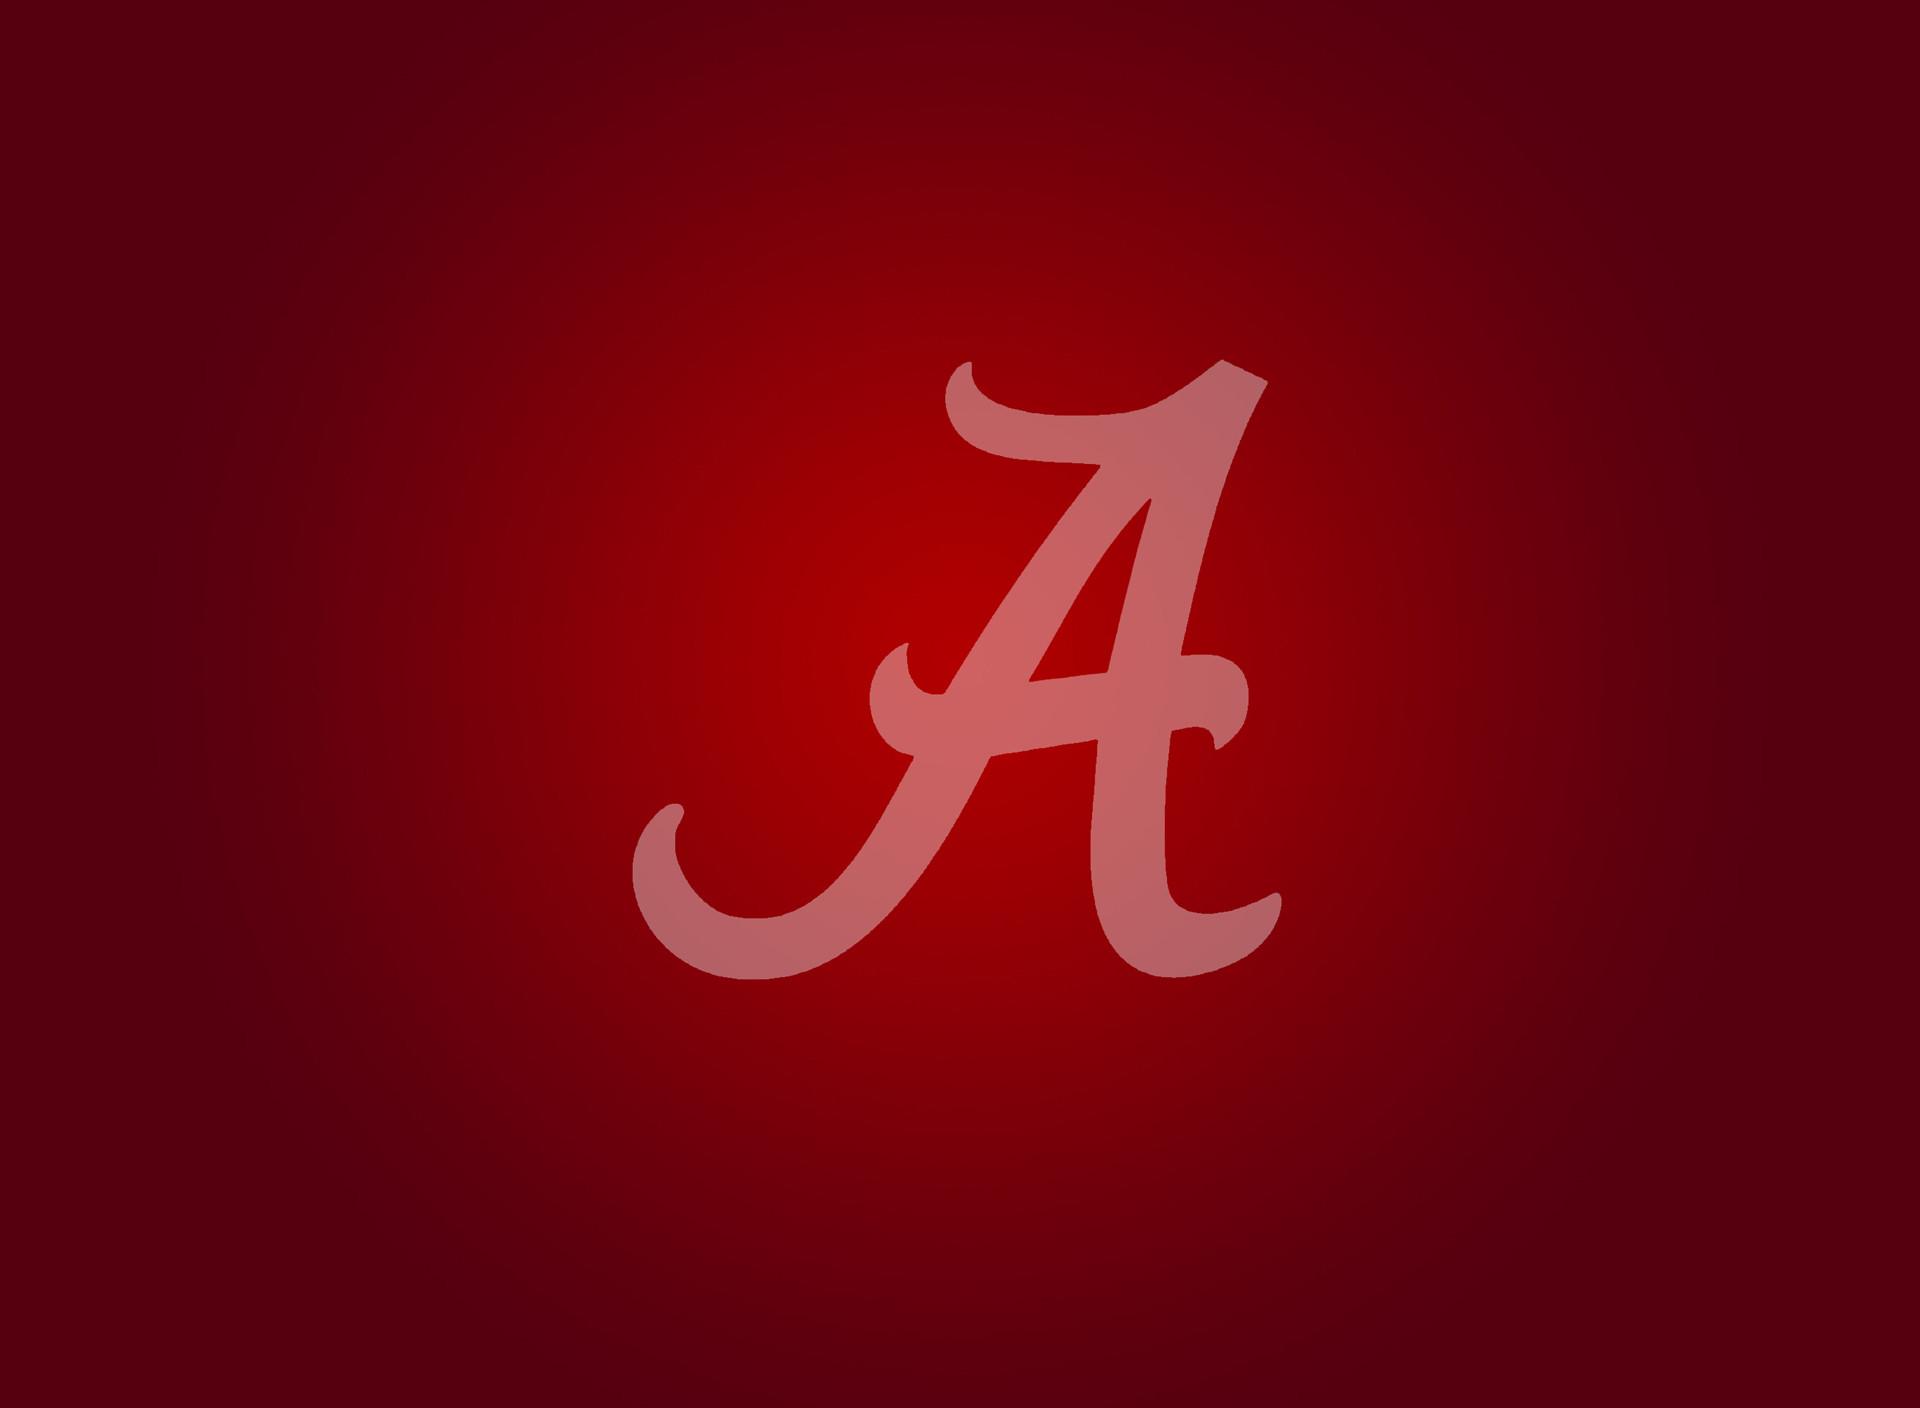 Alabama Screensavers Search Pictures Photos